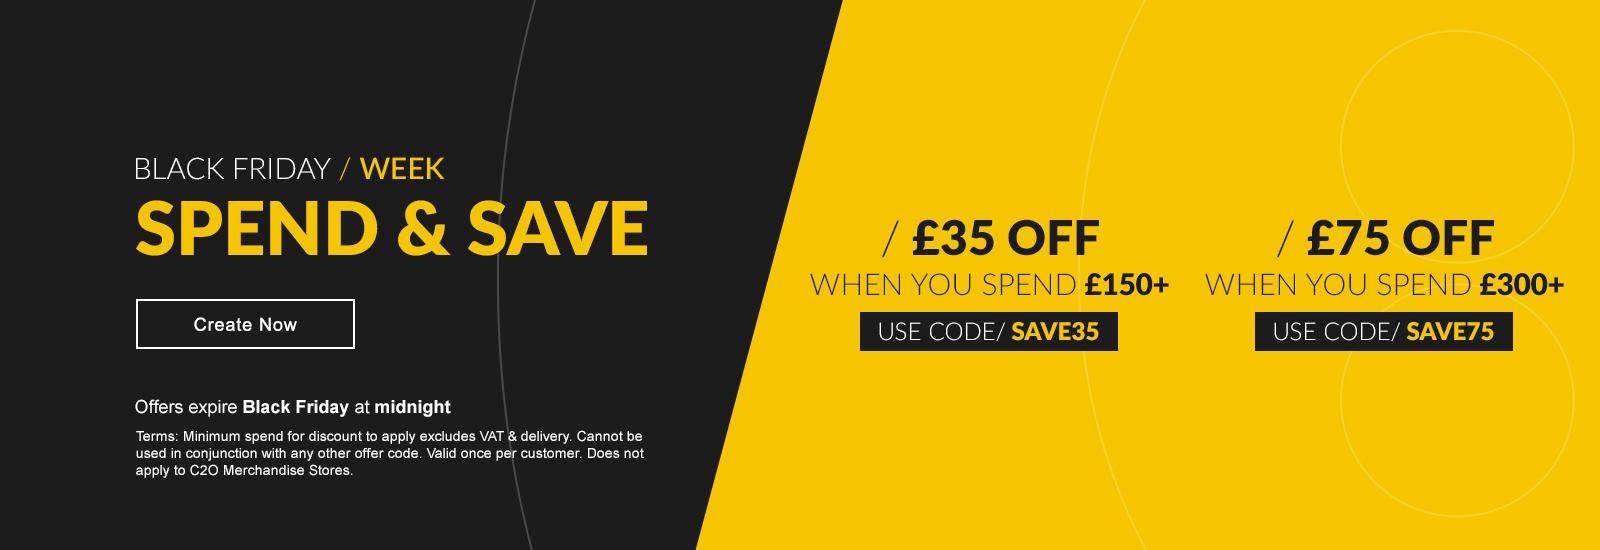 Black Friday Spend & Save